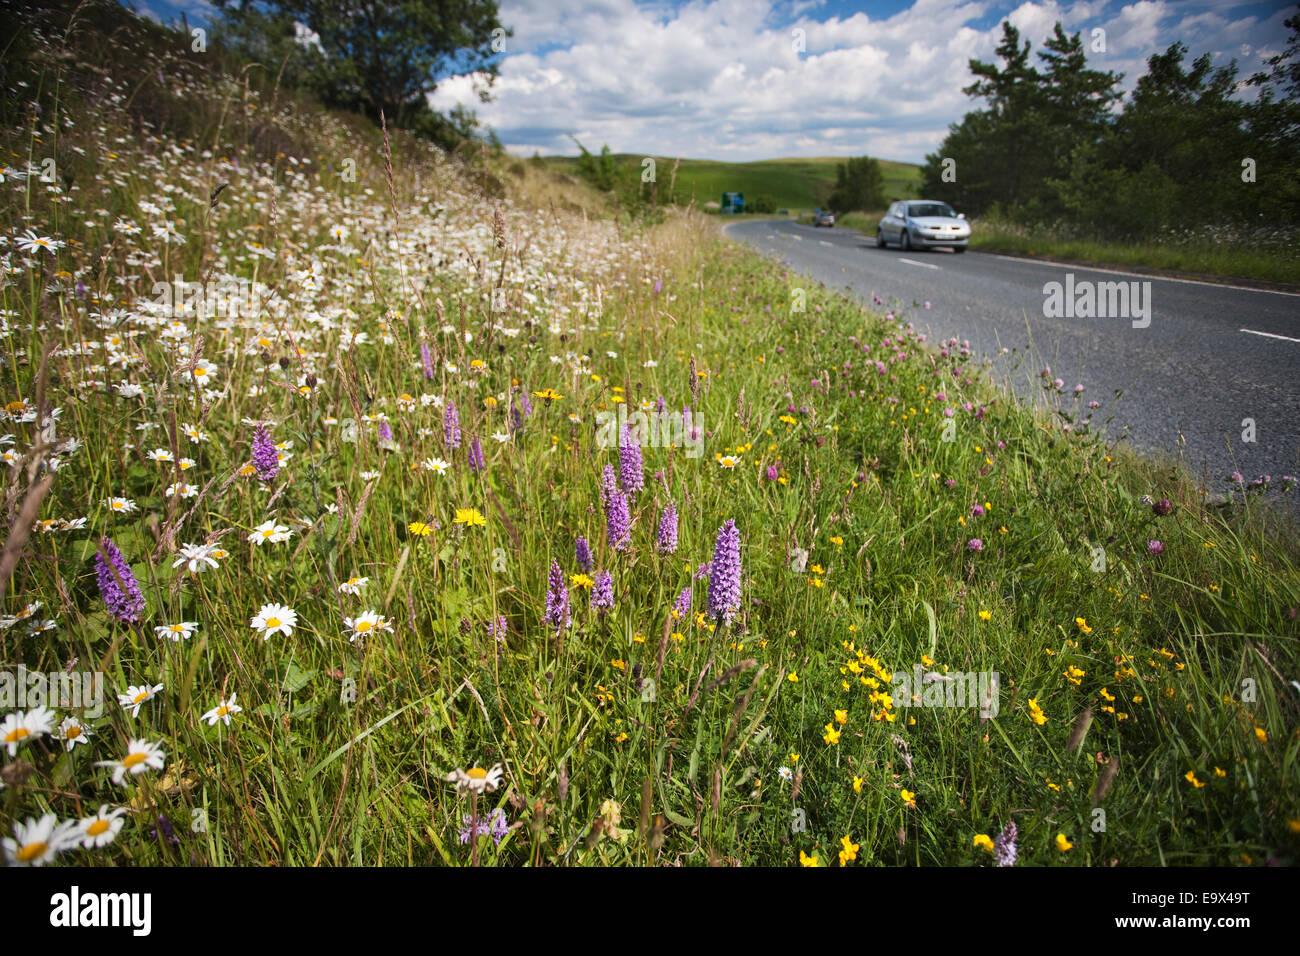 Wildflowers growing on roadside verge, Cumbria, UK - Stock Image